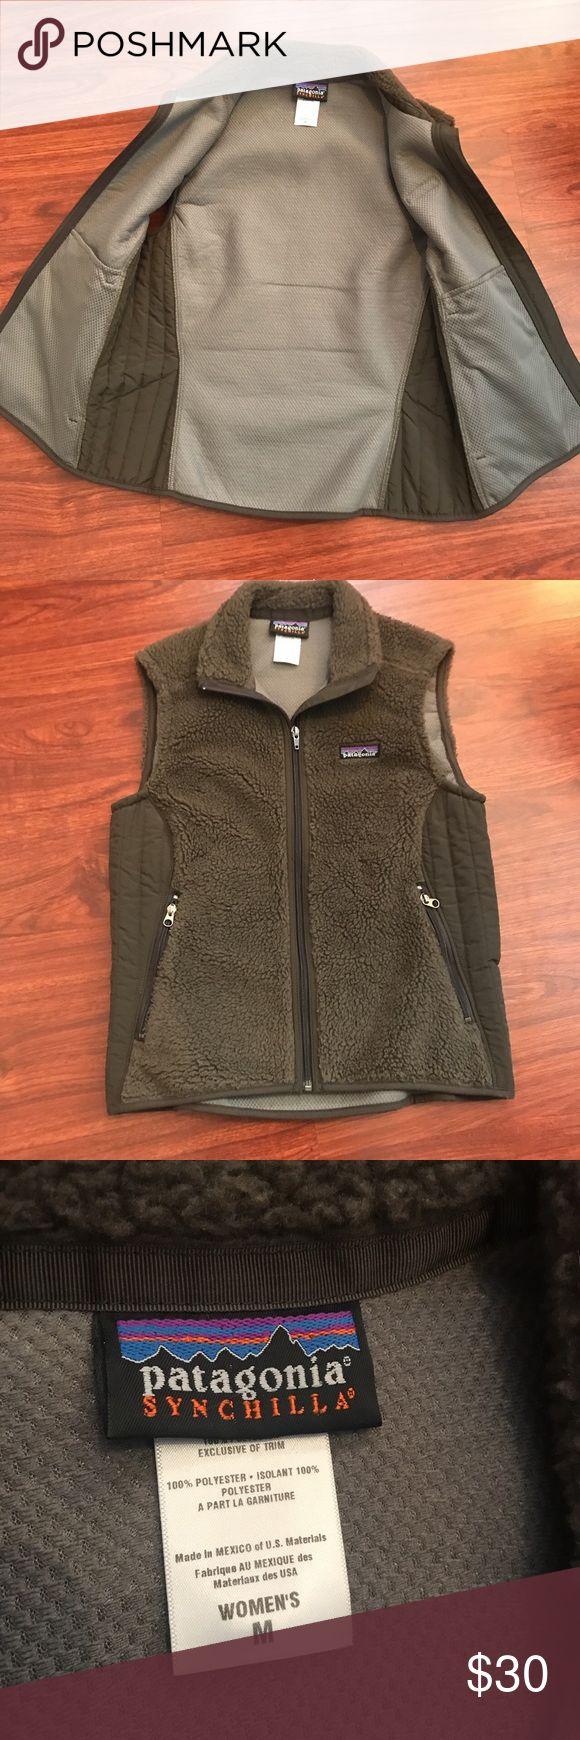 Patagonia fleece vest. Like new vest no wear or tear. Patagonia Jackets & Coats Vests